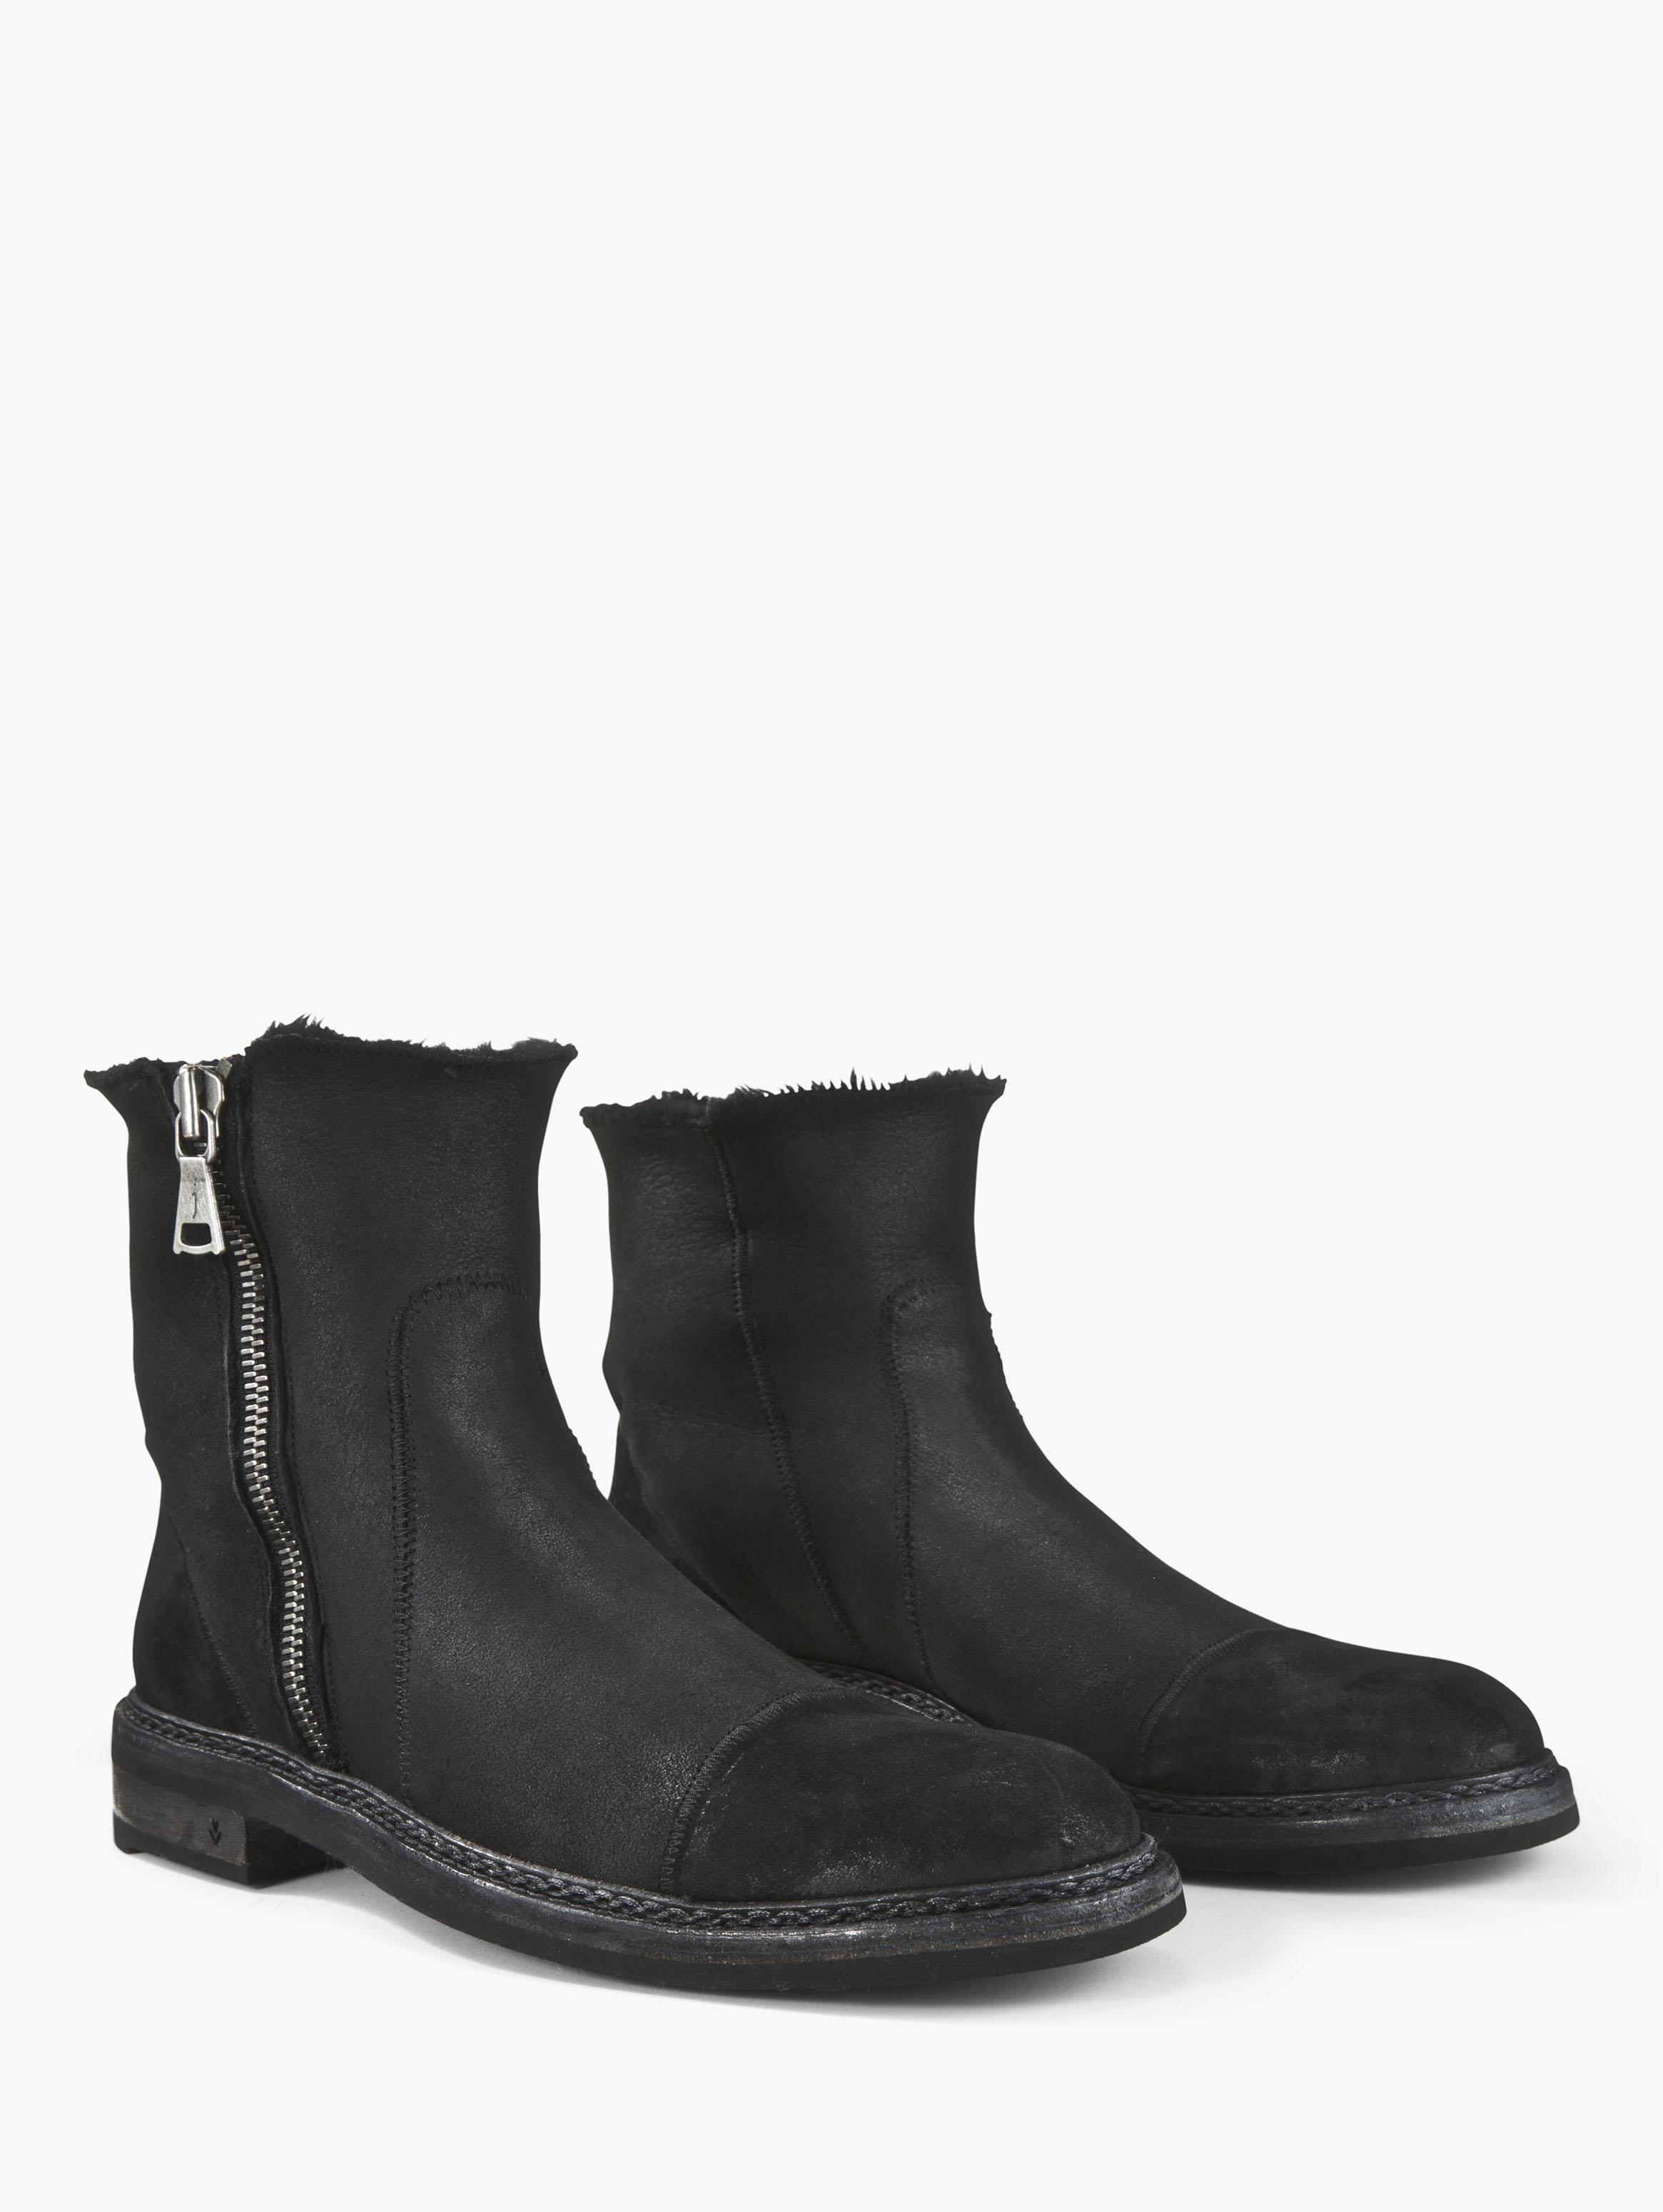 John Varvatos Ellis Shearling Boot Black Size: 12 W22VSvxN3M